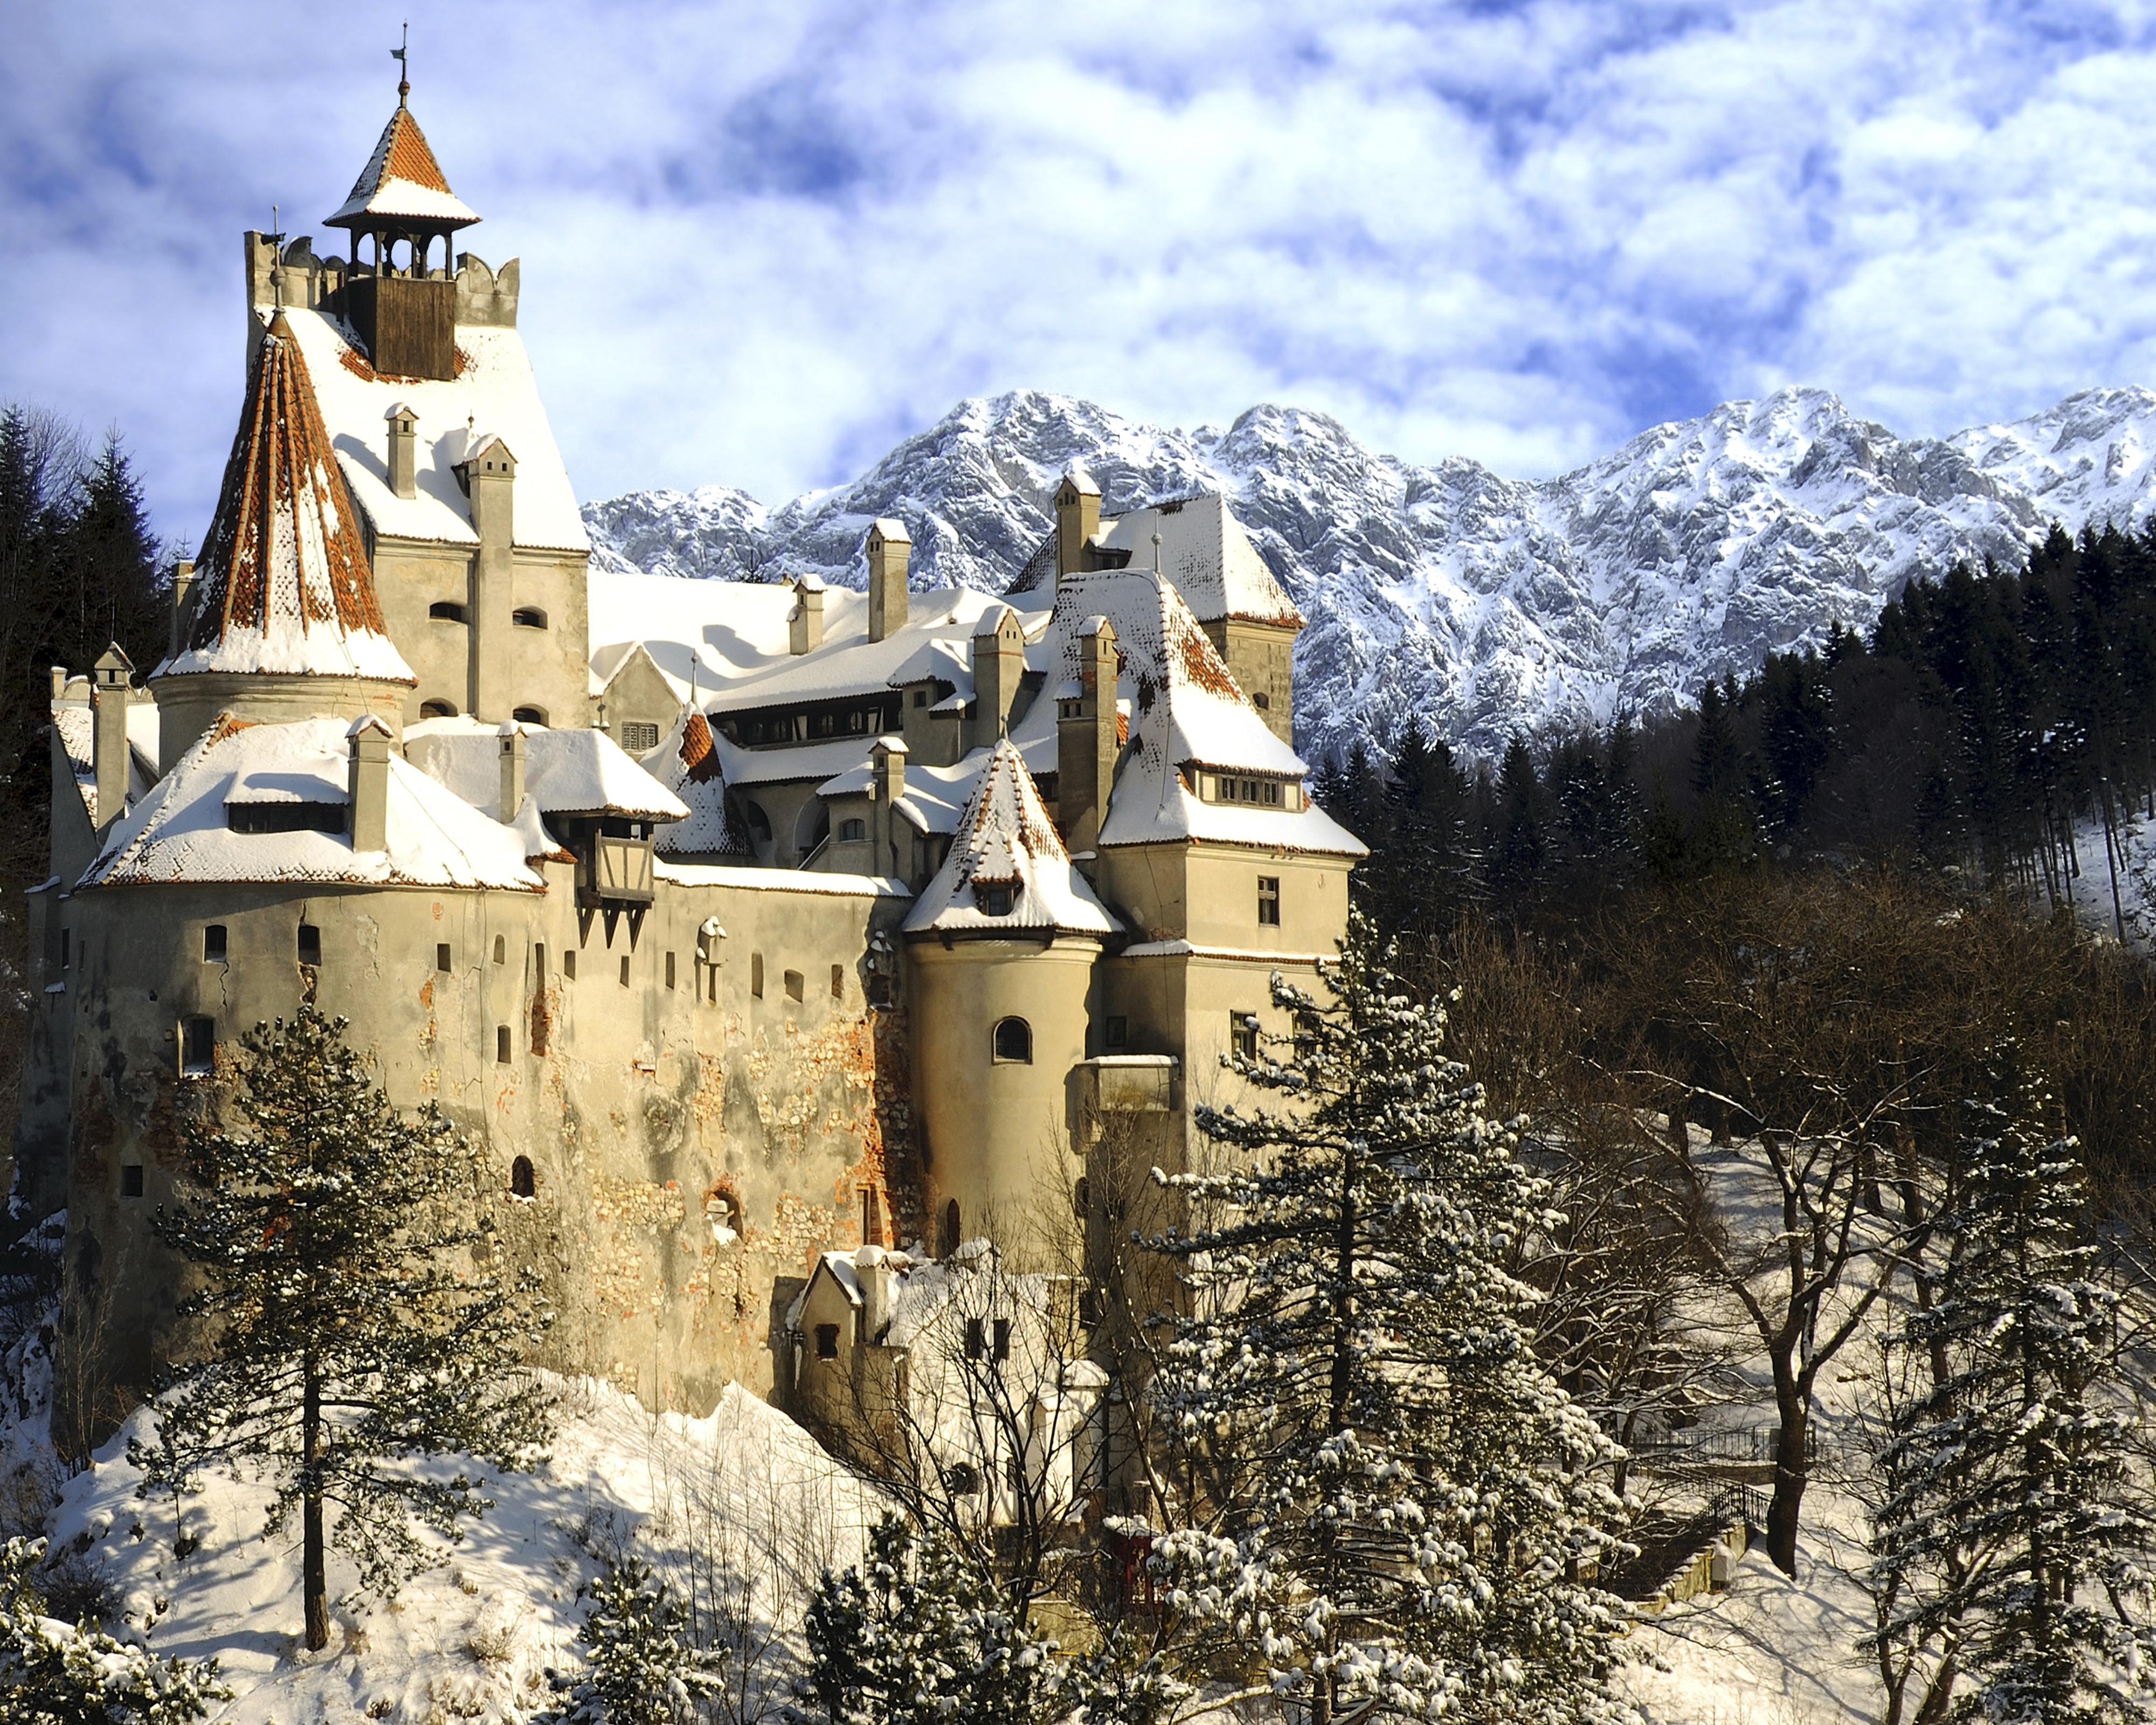 2Transylvania winter